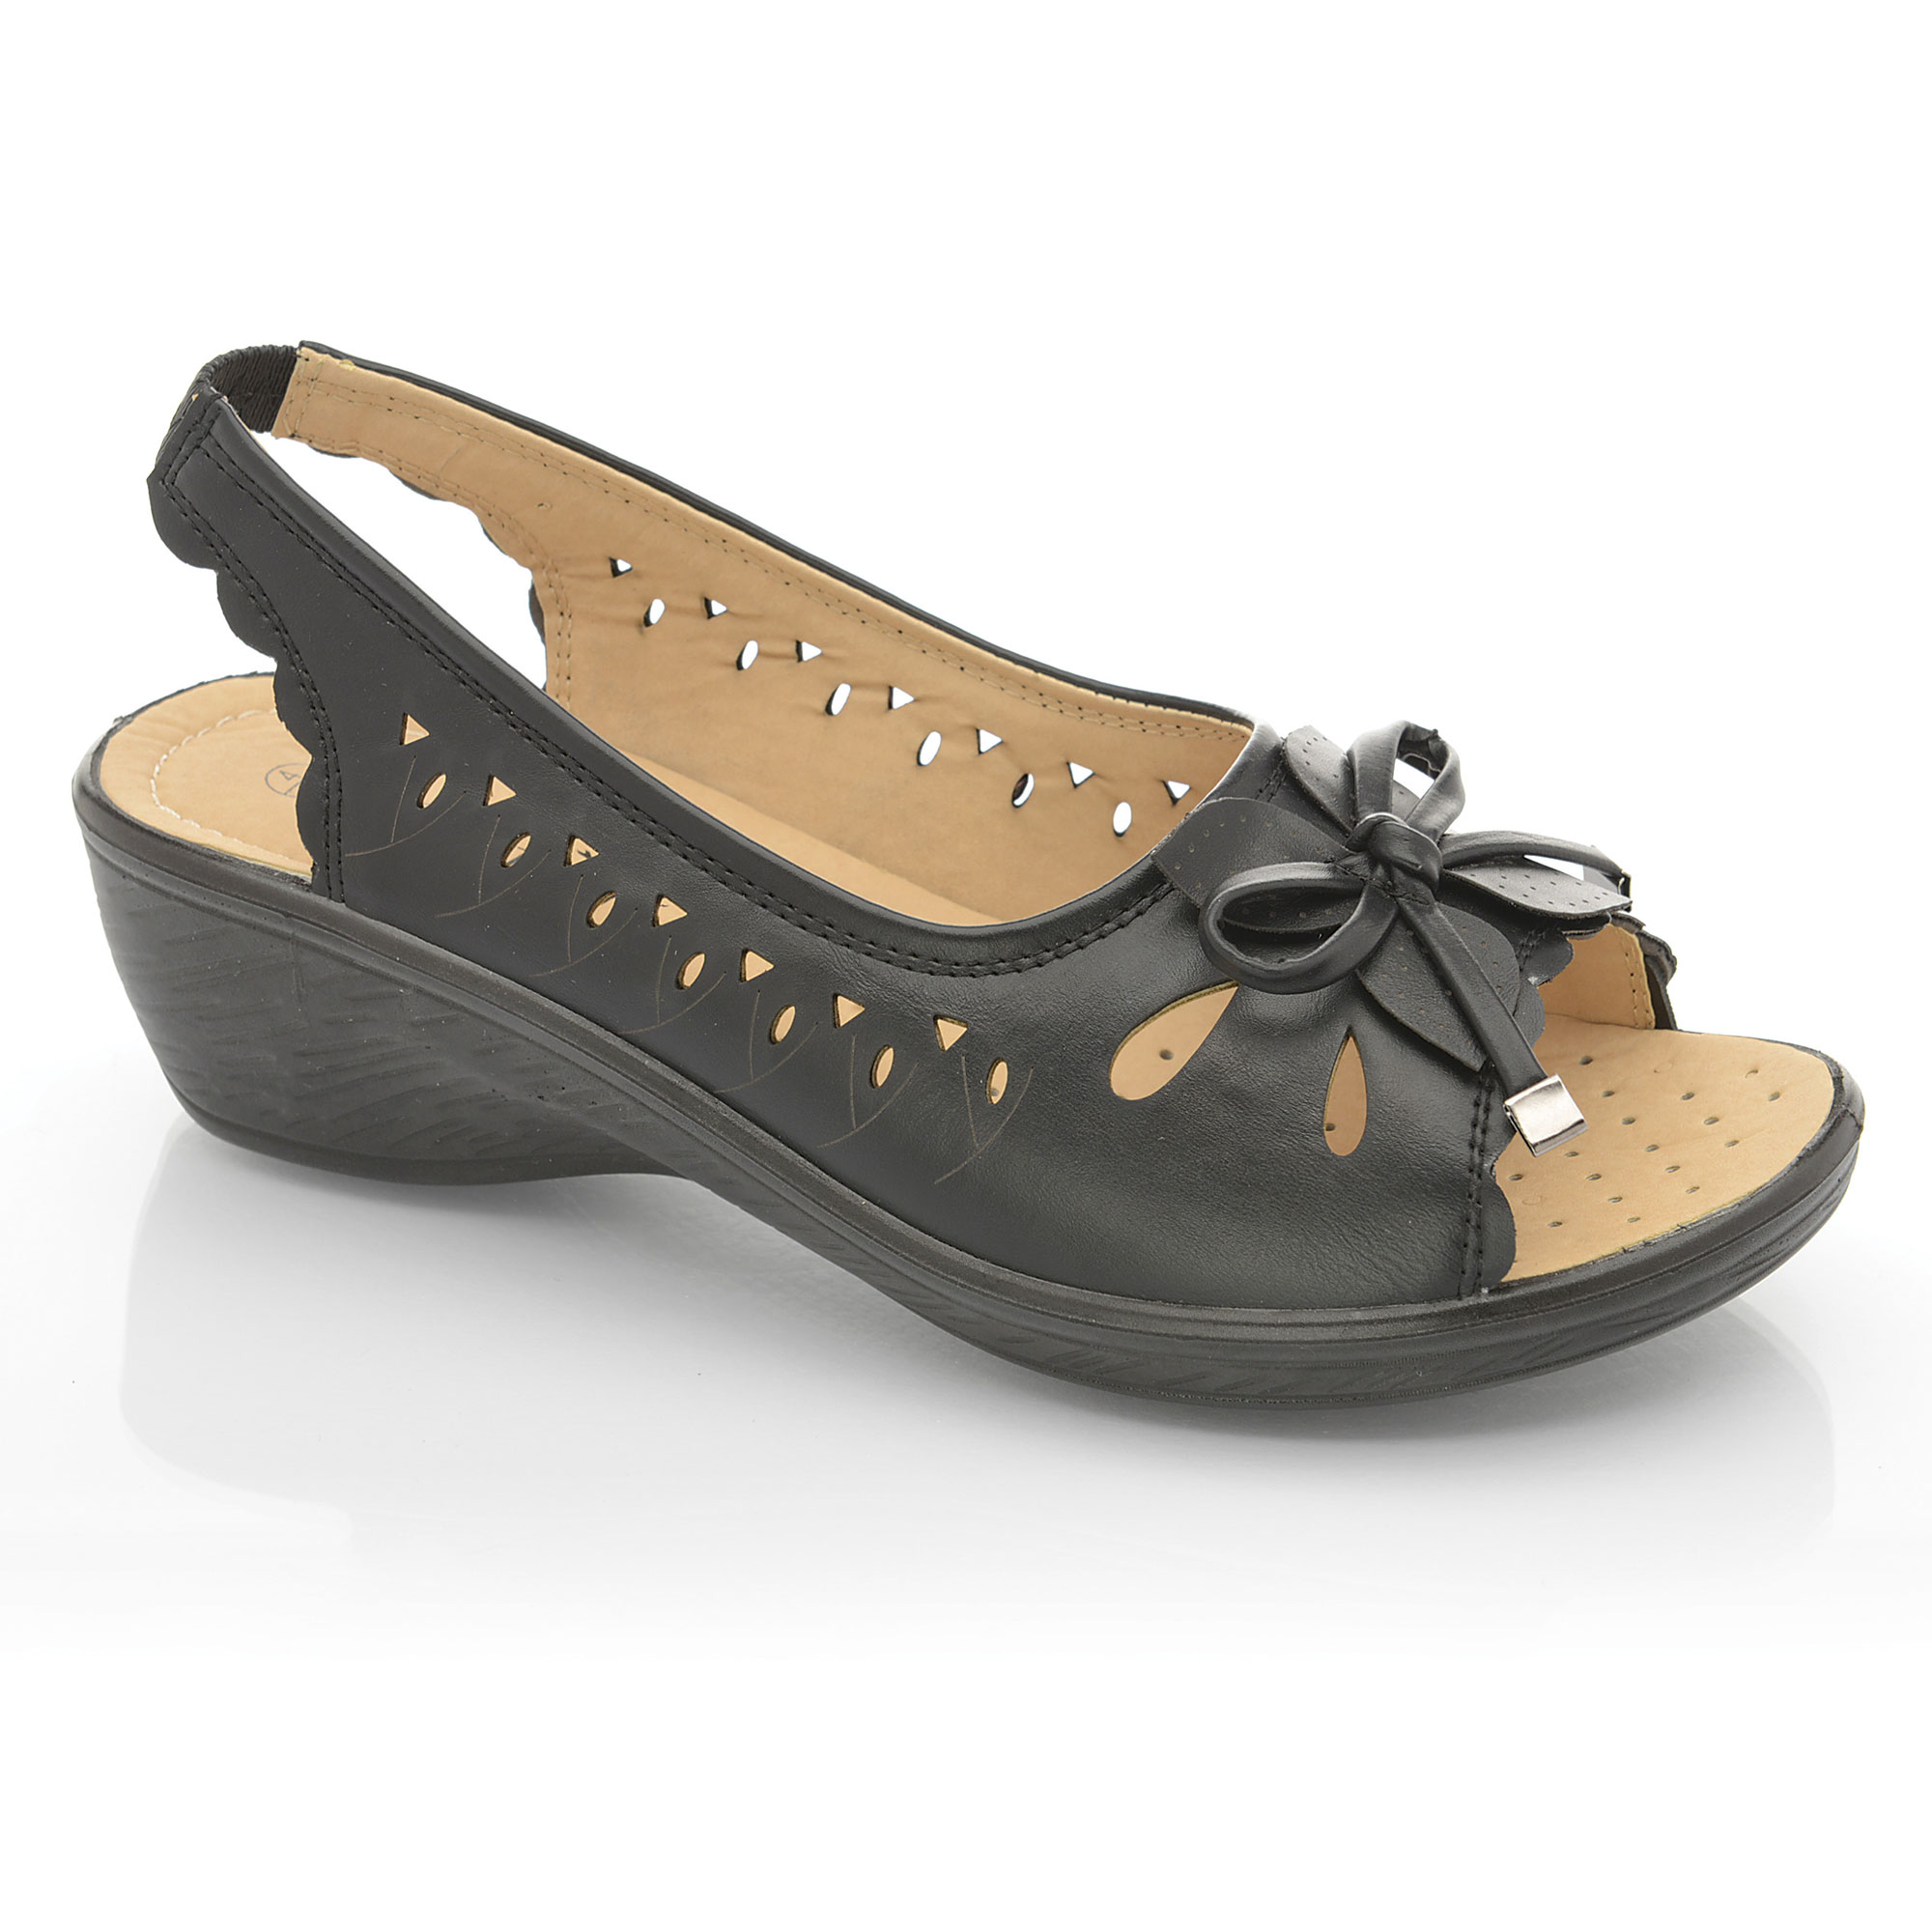 solsoft helpful wedge comfort comforter us platform wedges reviews customer nude women pcr s sandals m in pu rated toetos mid best heel